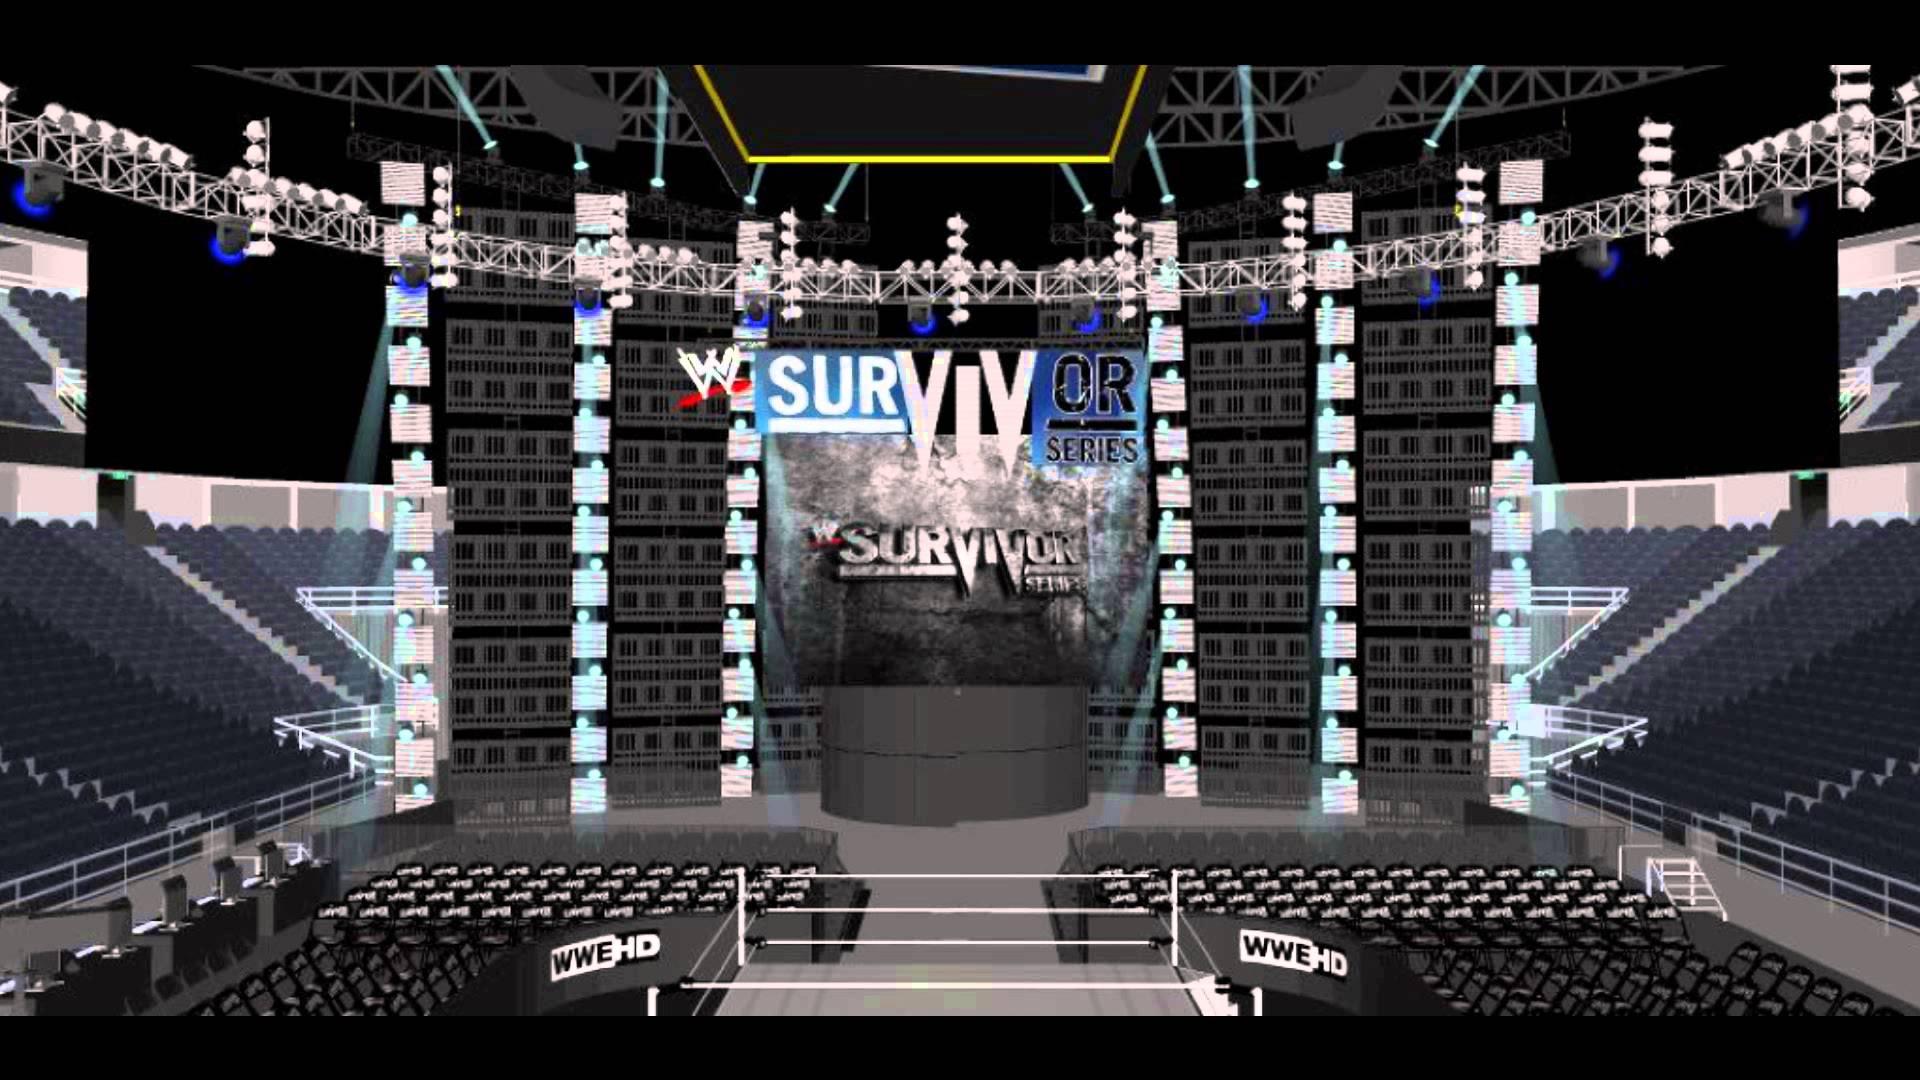 HQ WWE Survivor Series 2012 Wallpapers   File 240.66Kb